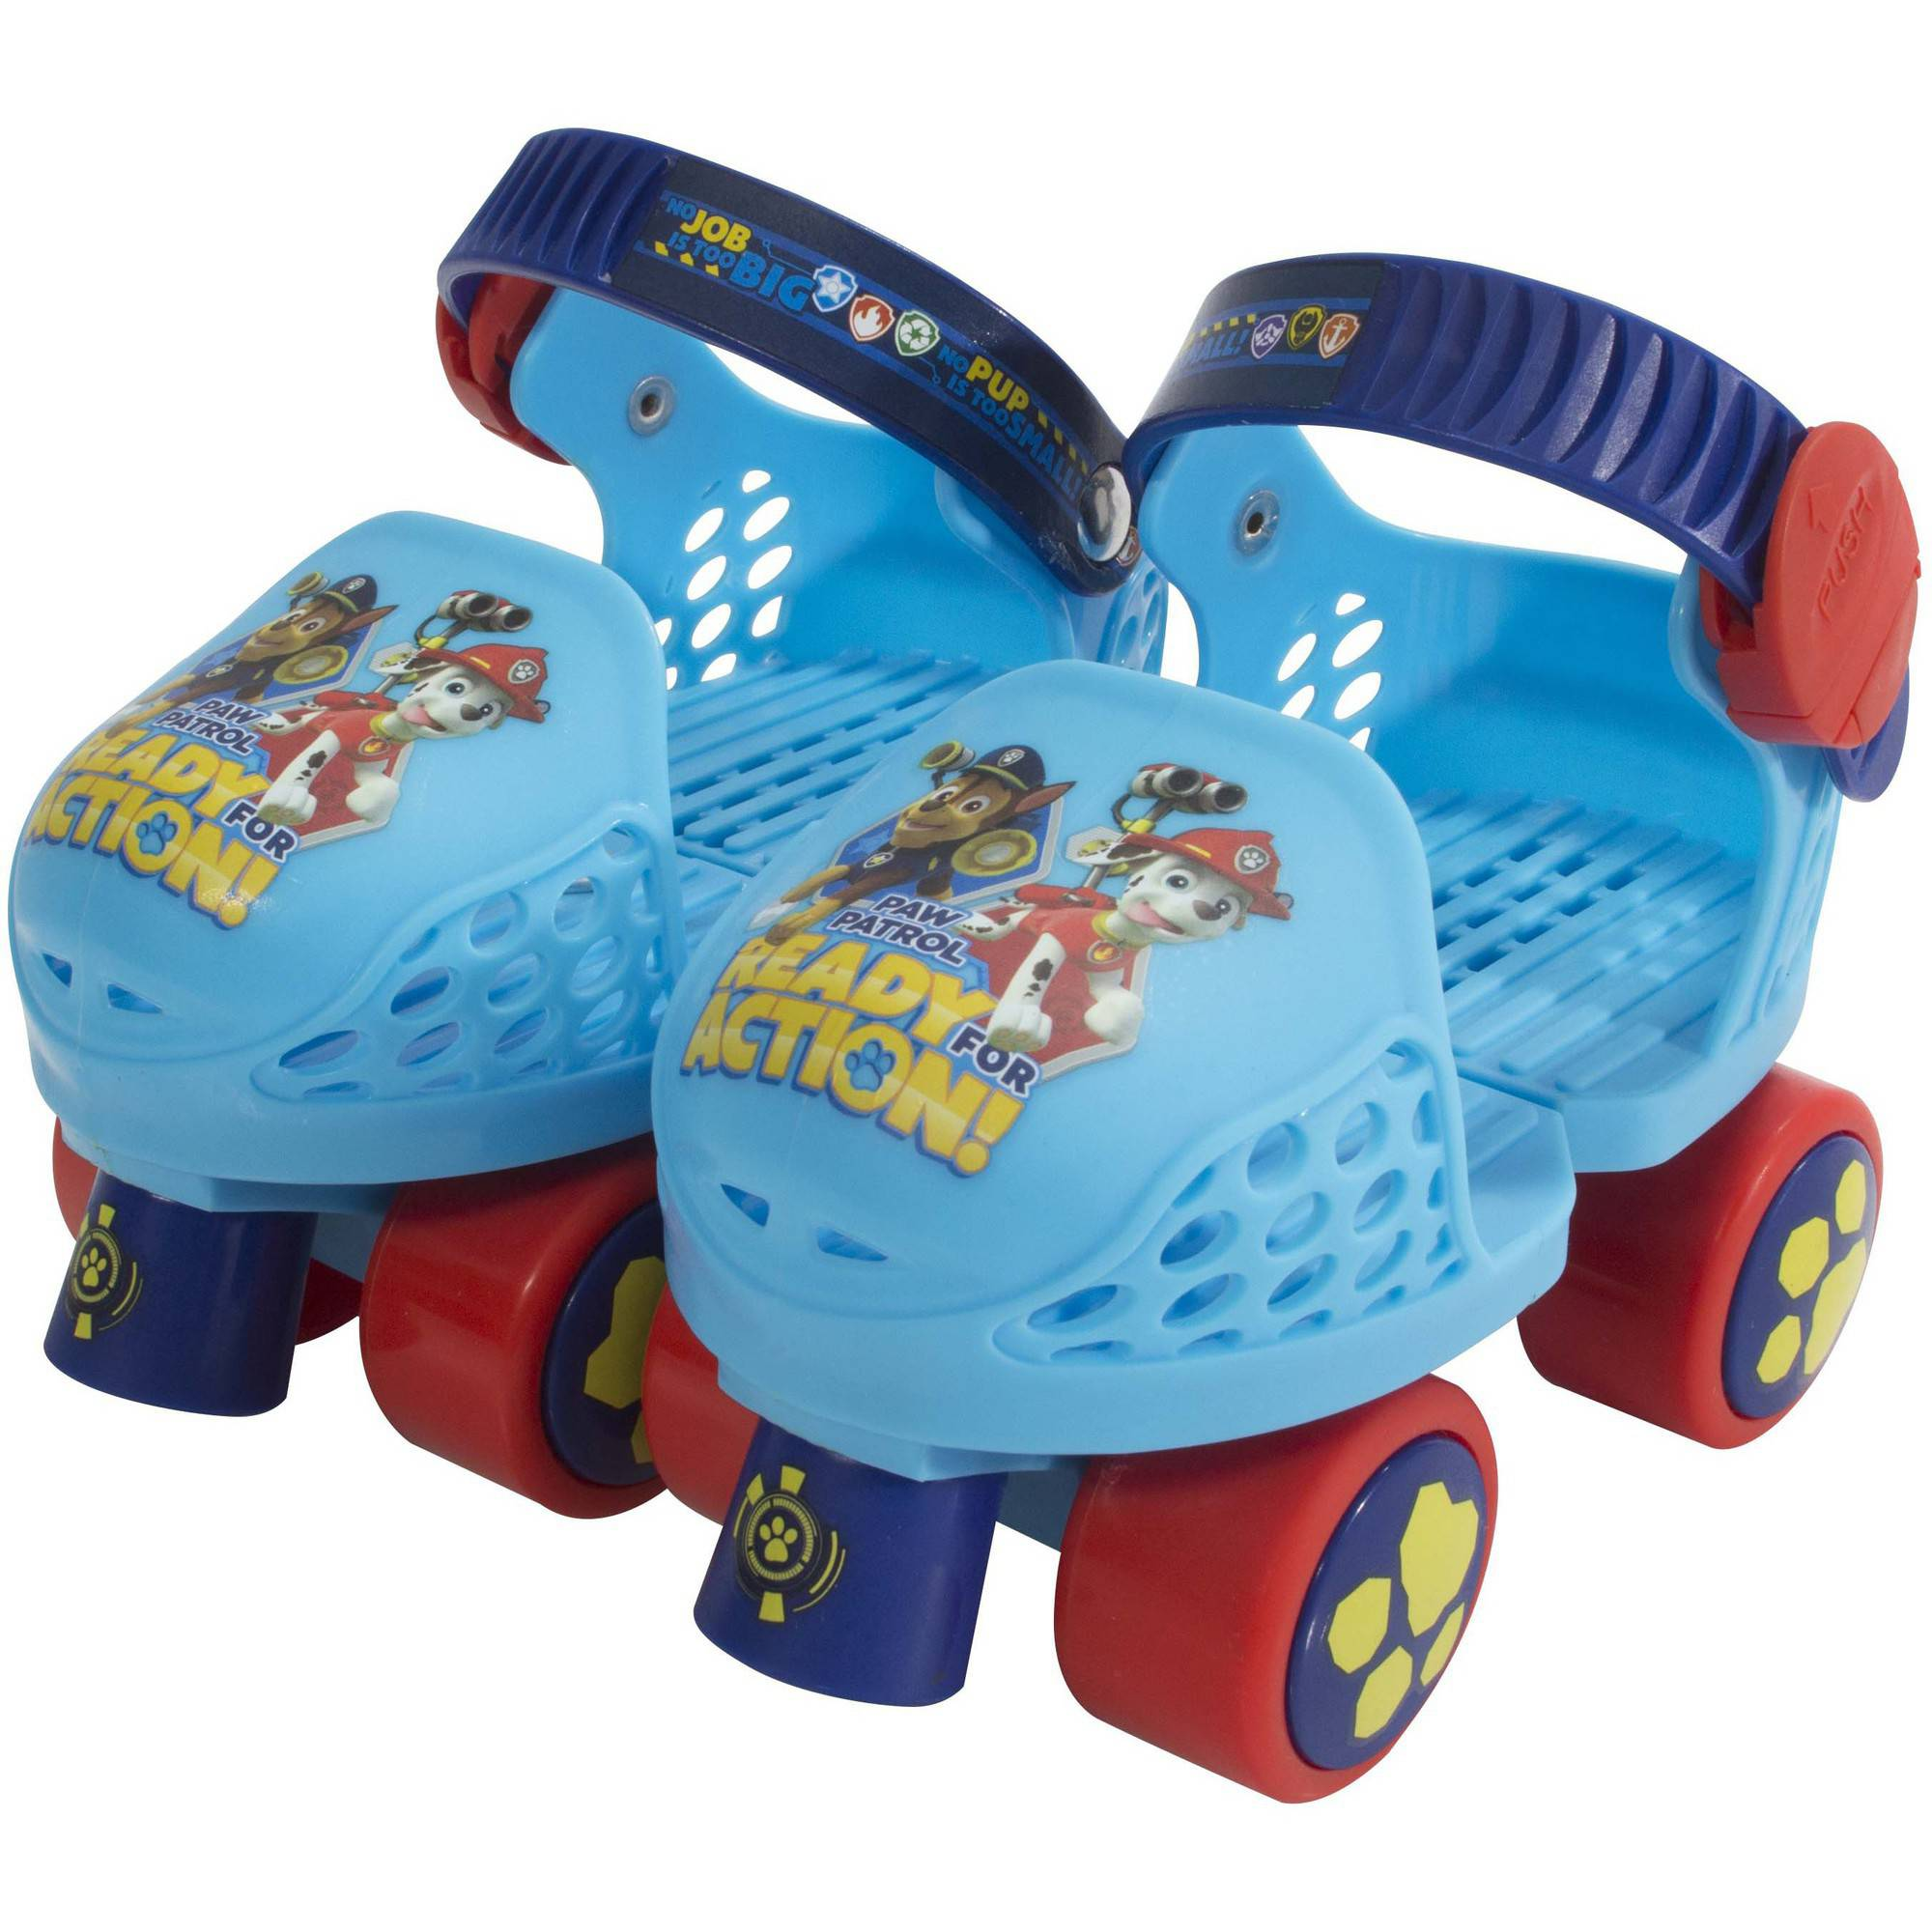 Frozen roller skates walmart - Frozen Roller Skates Walmart 22